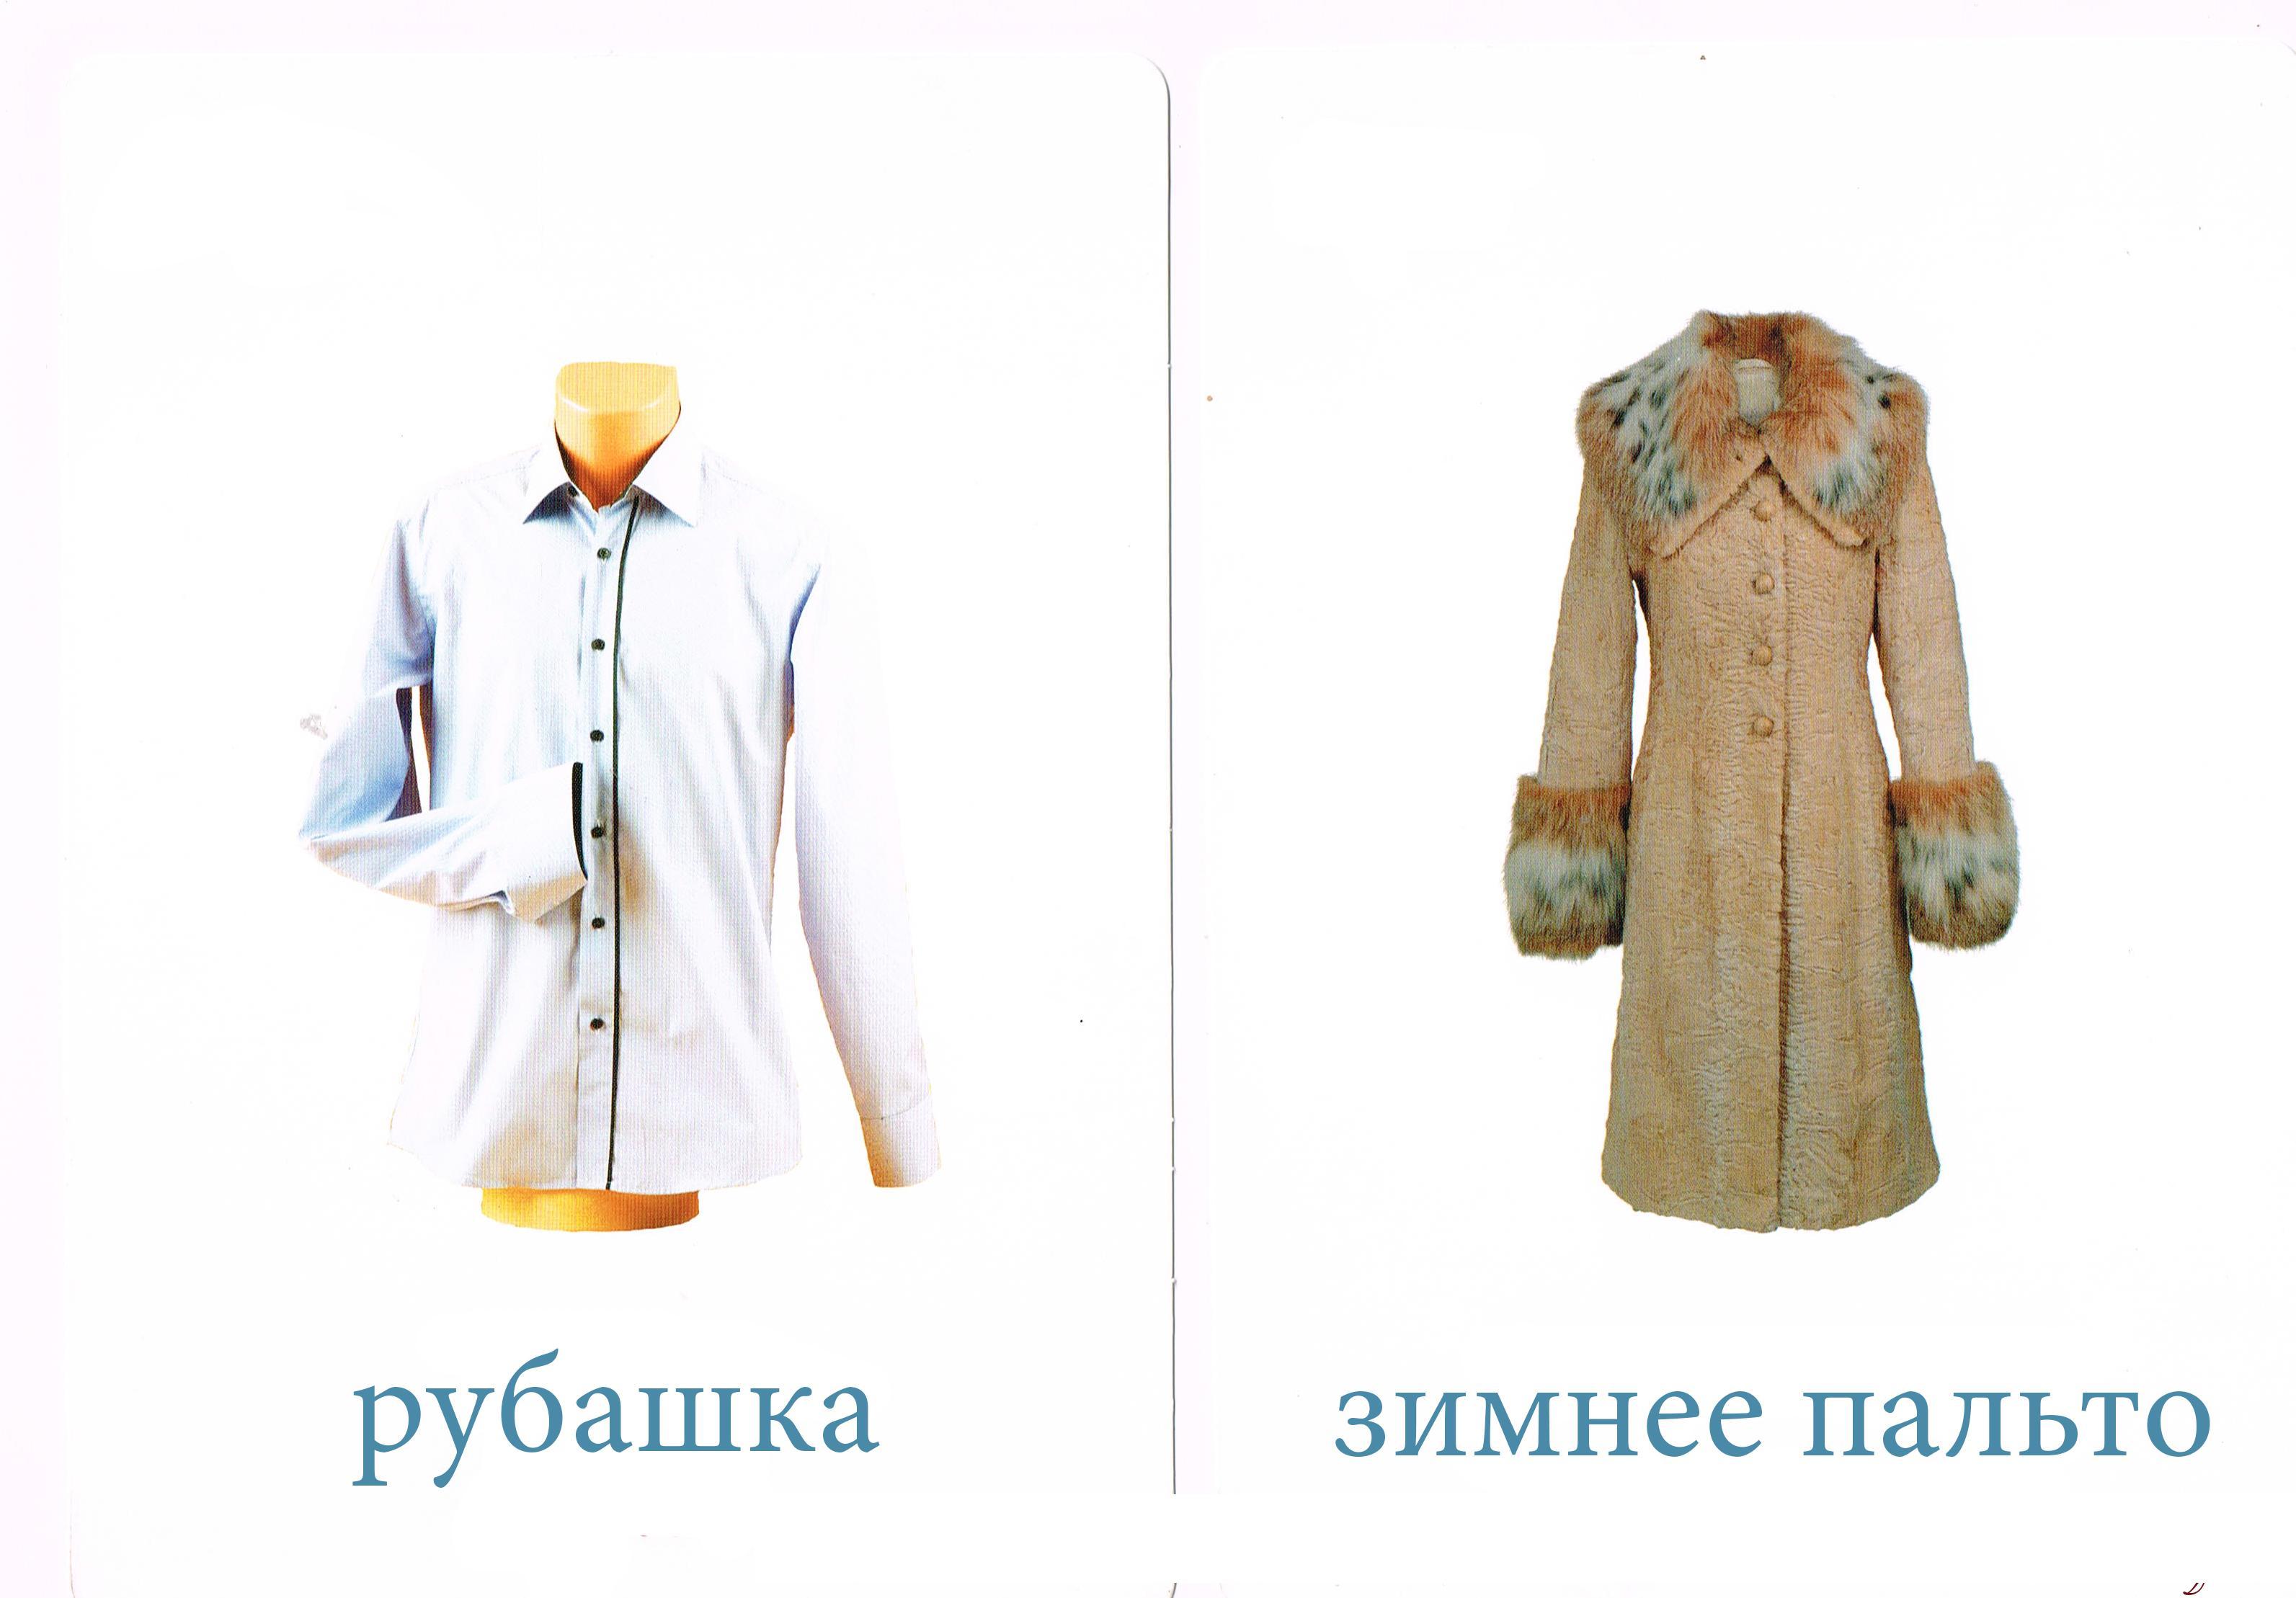 Рубашка, зимнее пальто